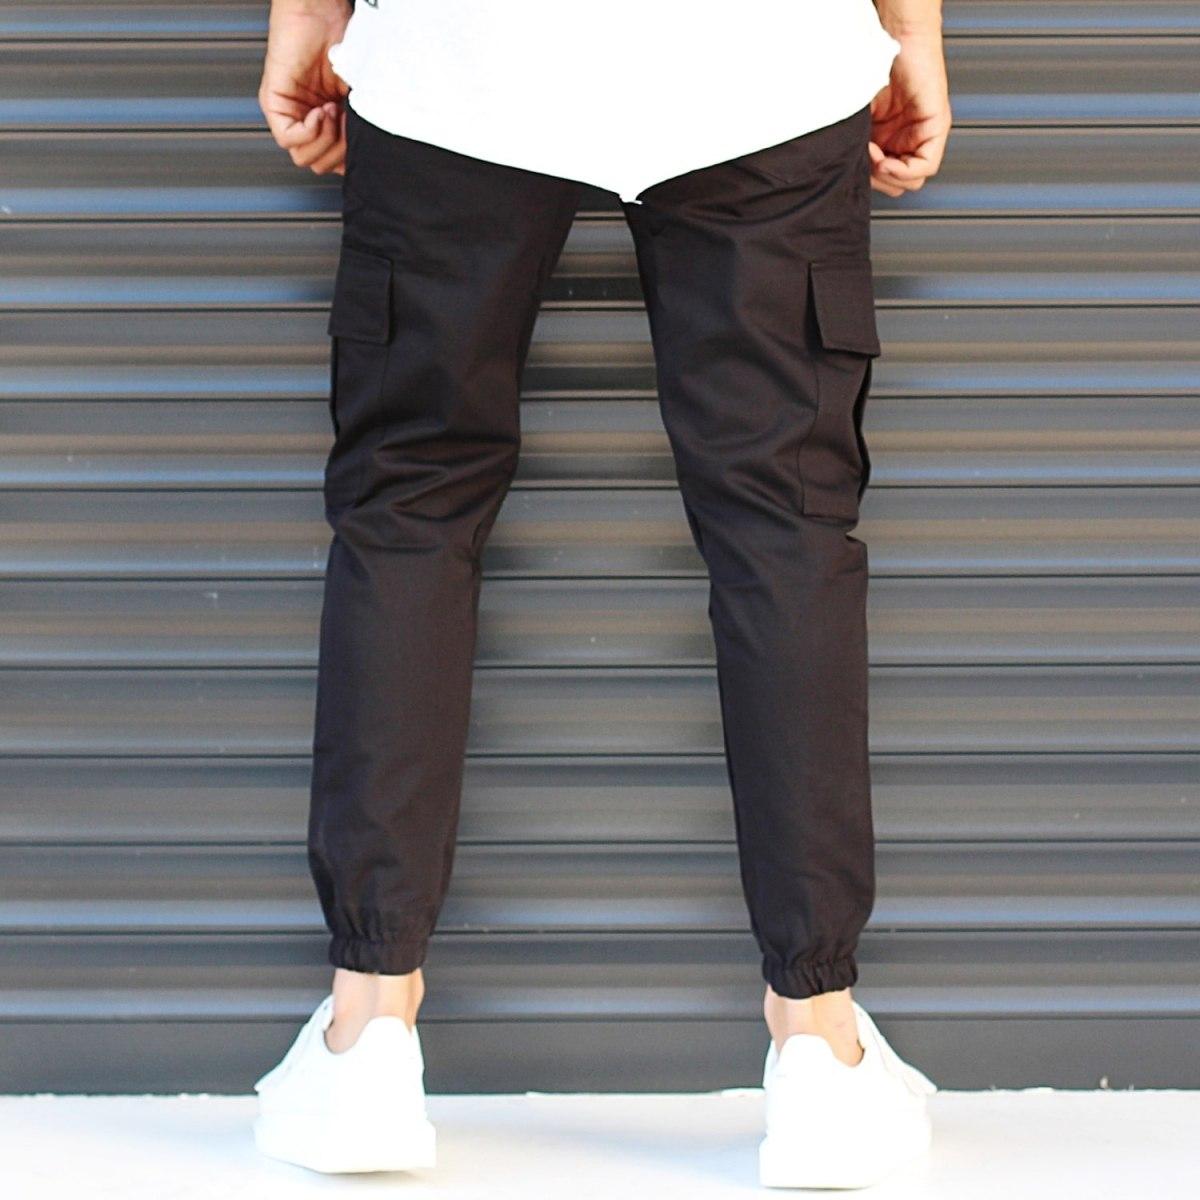 Men's Sport Pants With Side Pockets Black Mv Premium Brand - 4